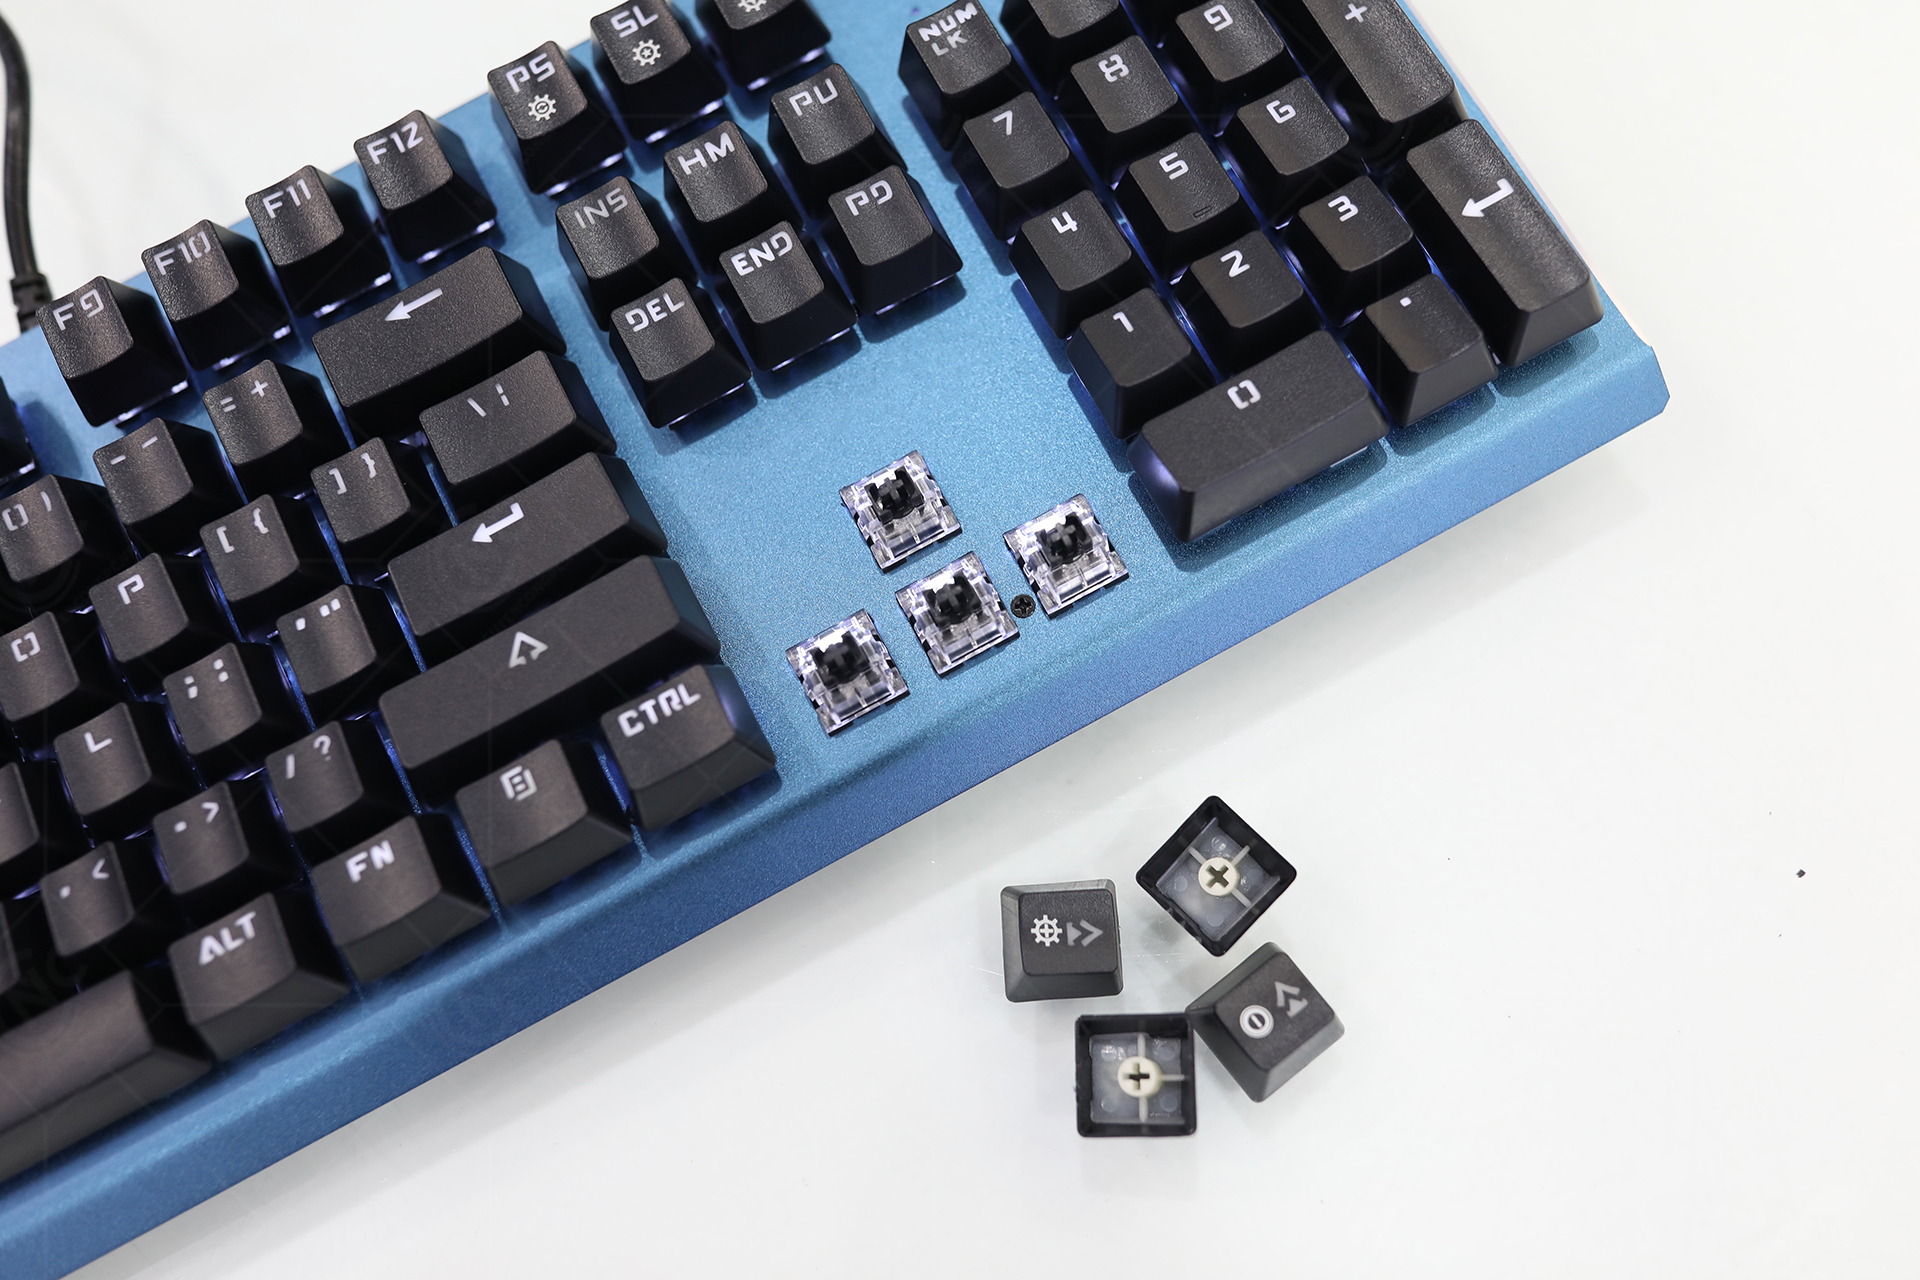 ban-phim-motospeed-ck108-blue-led-white-6